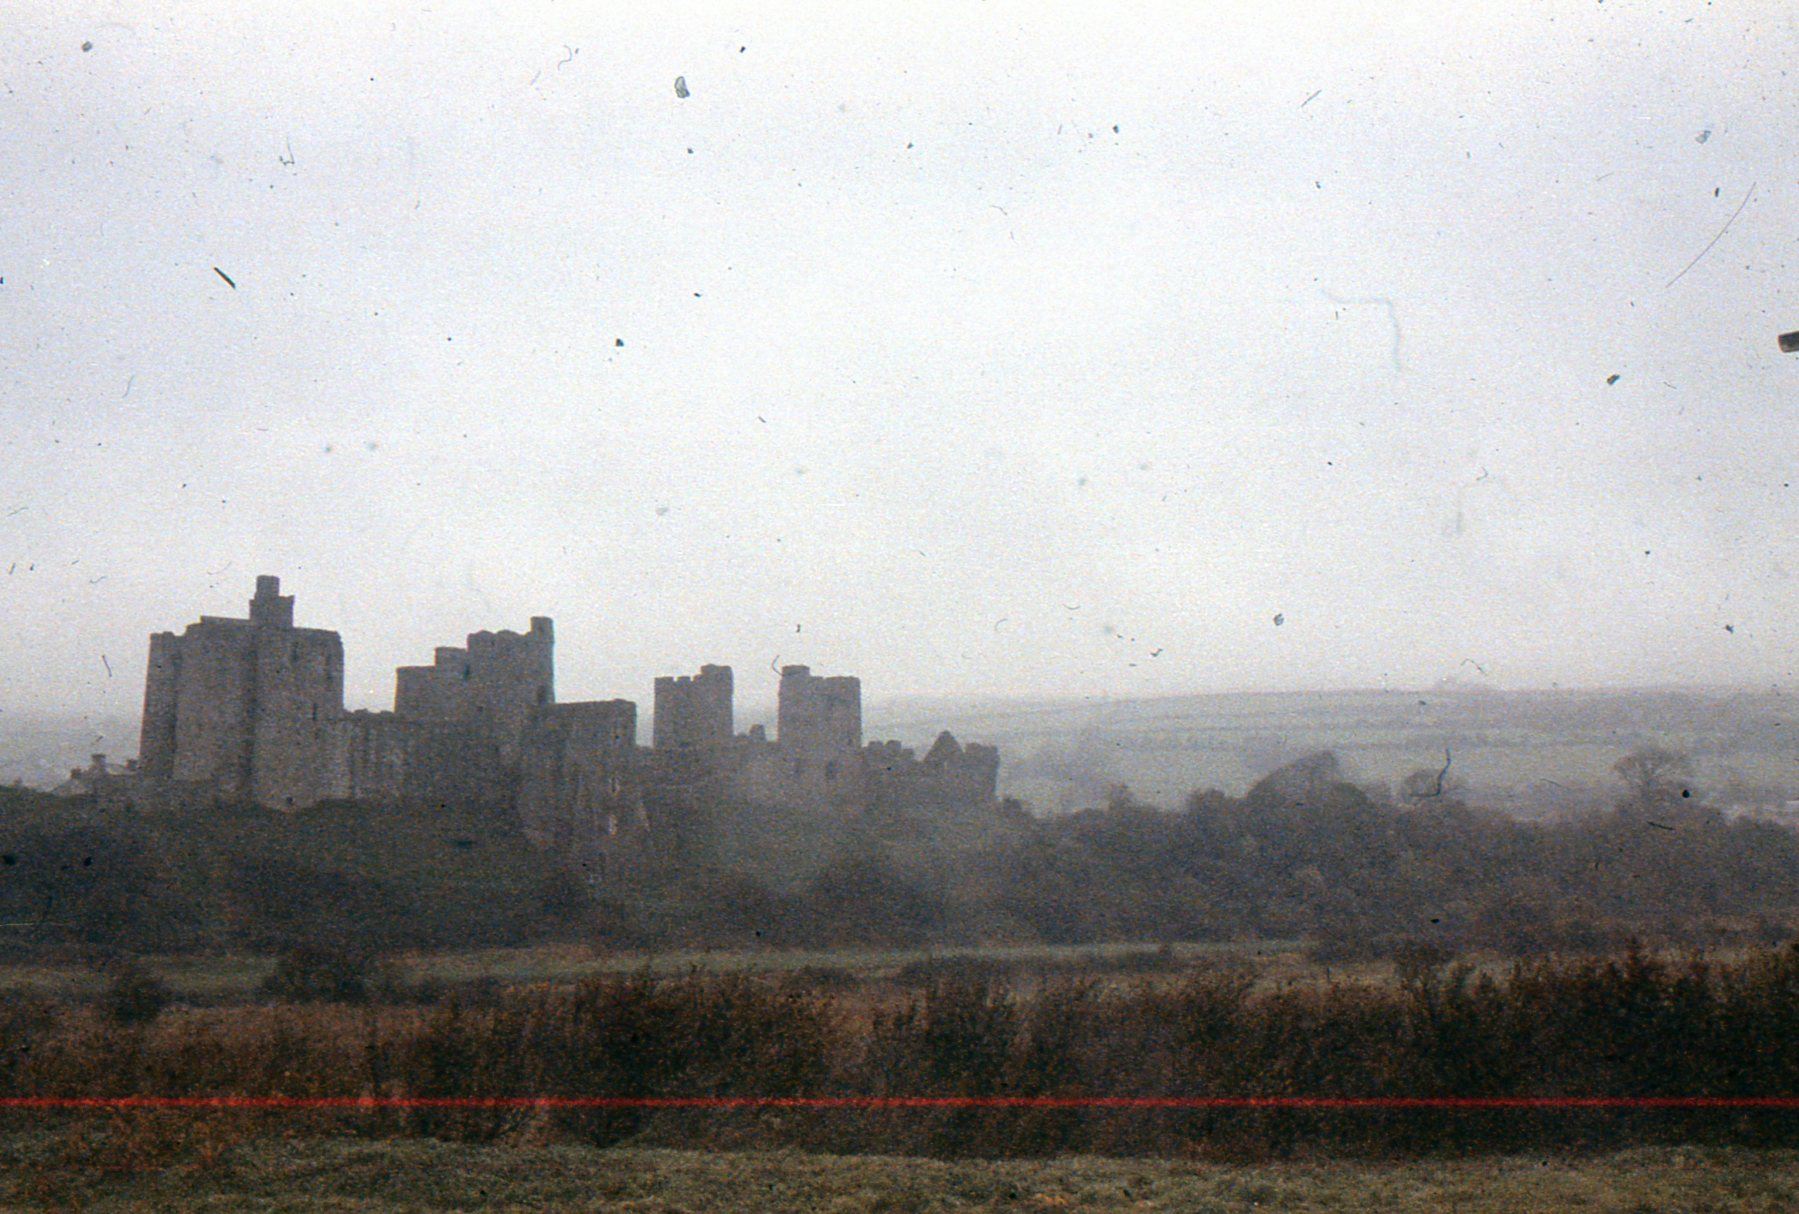 Kidwelly, Wales